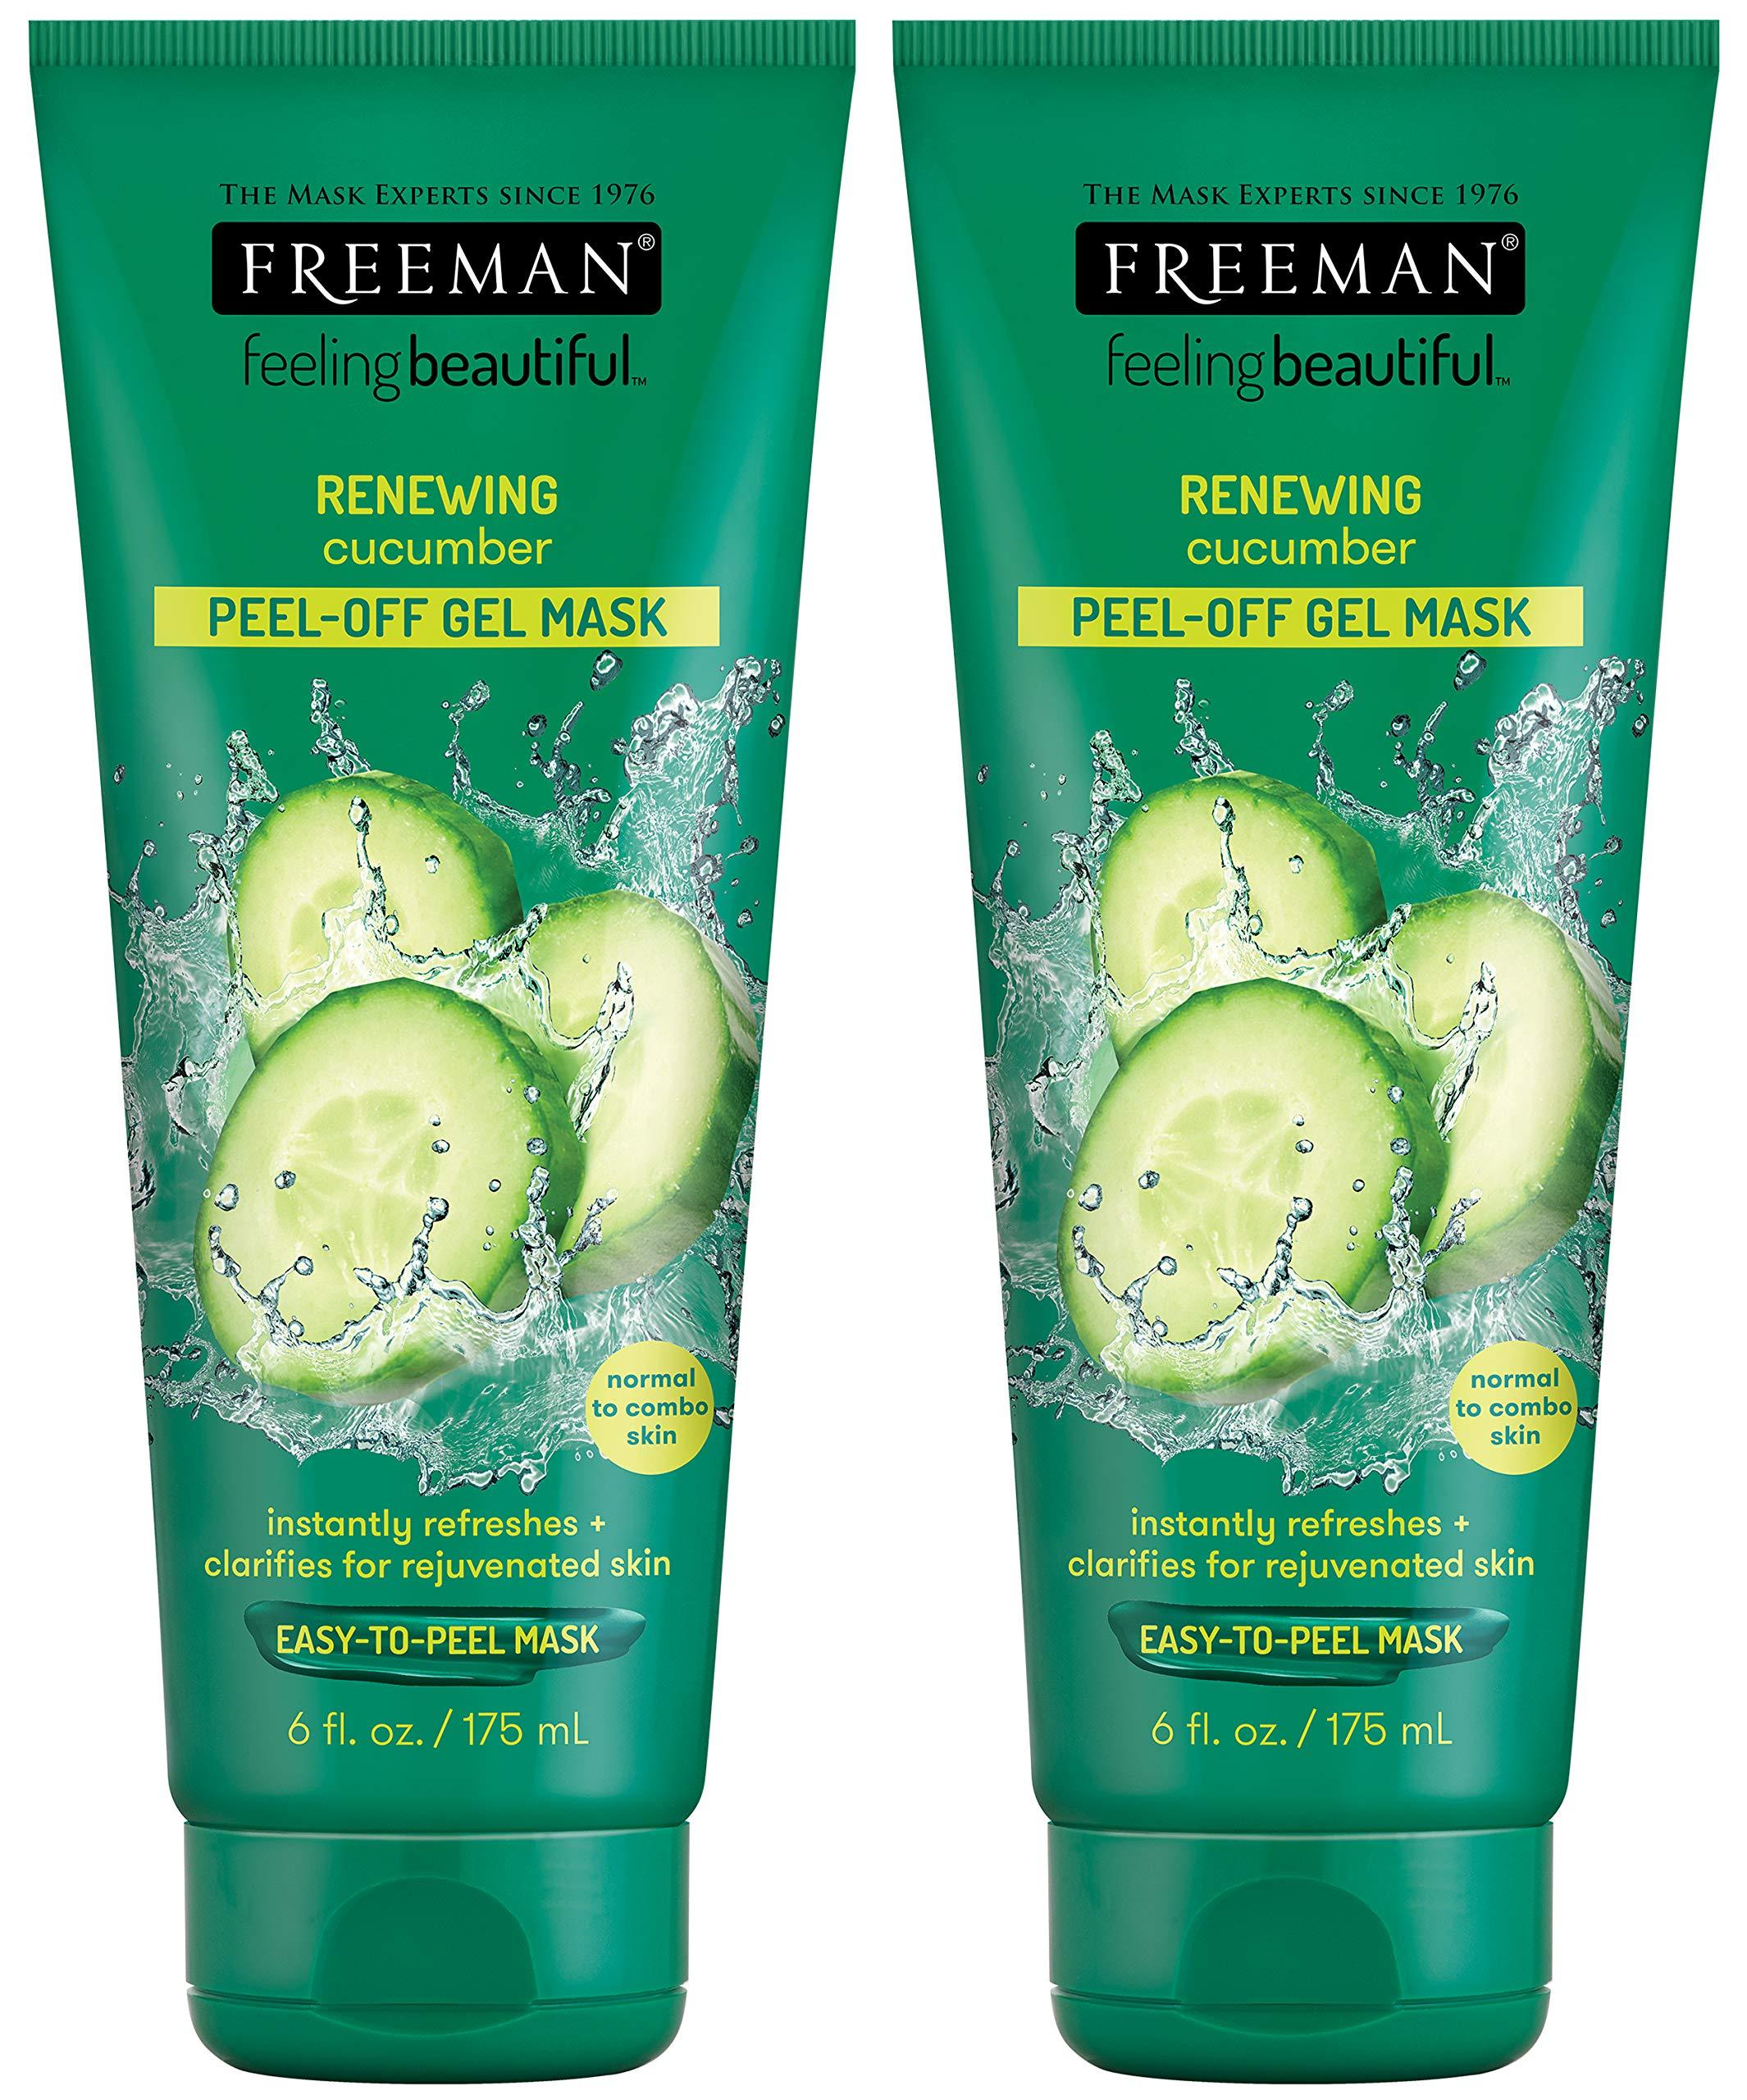 Freeman Feeling Beautiful Cucumber Peel Off